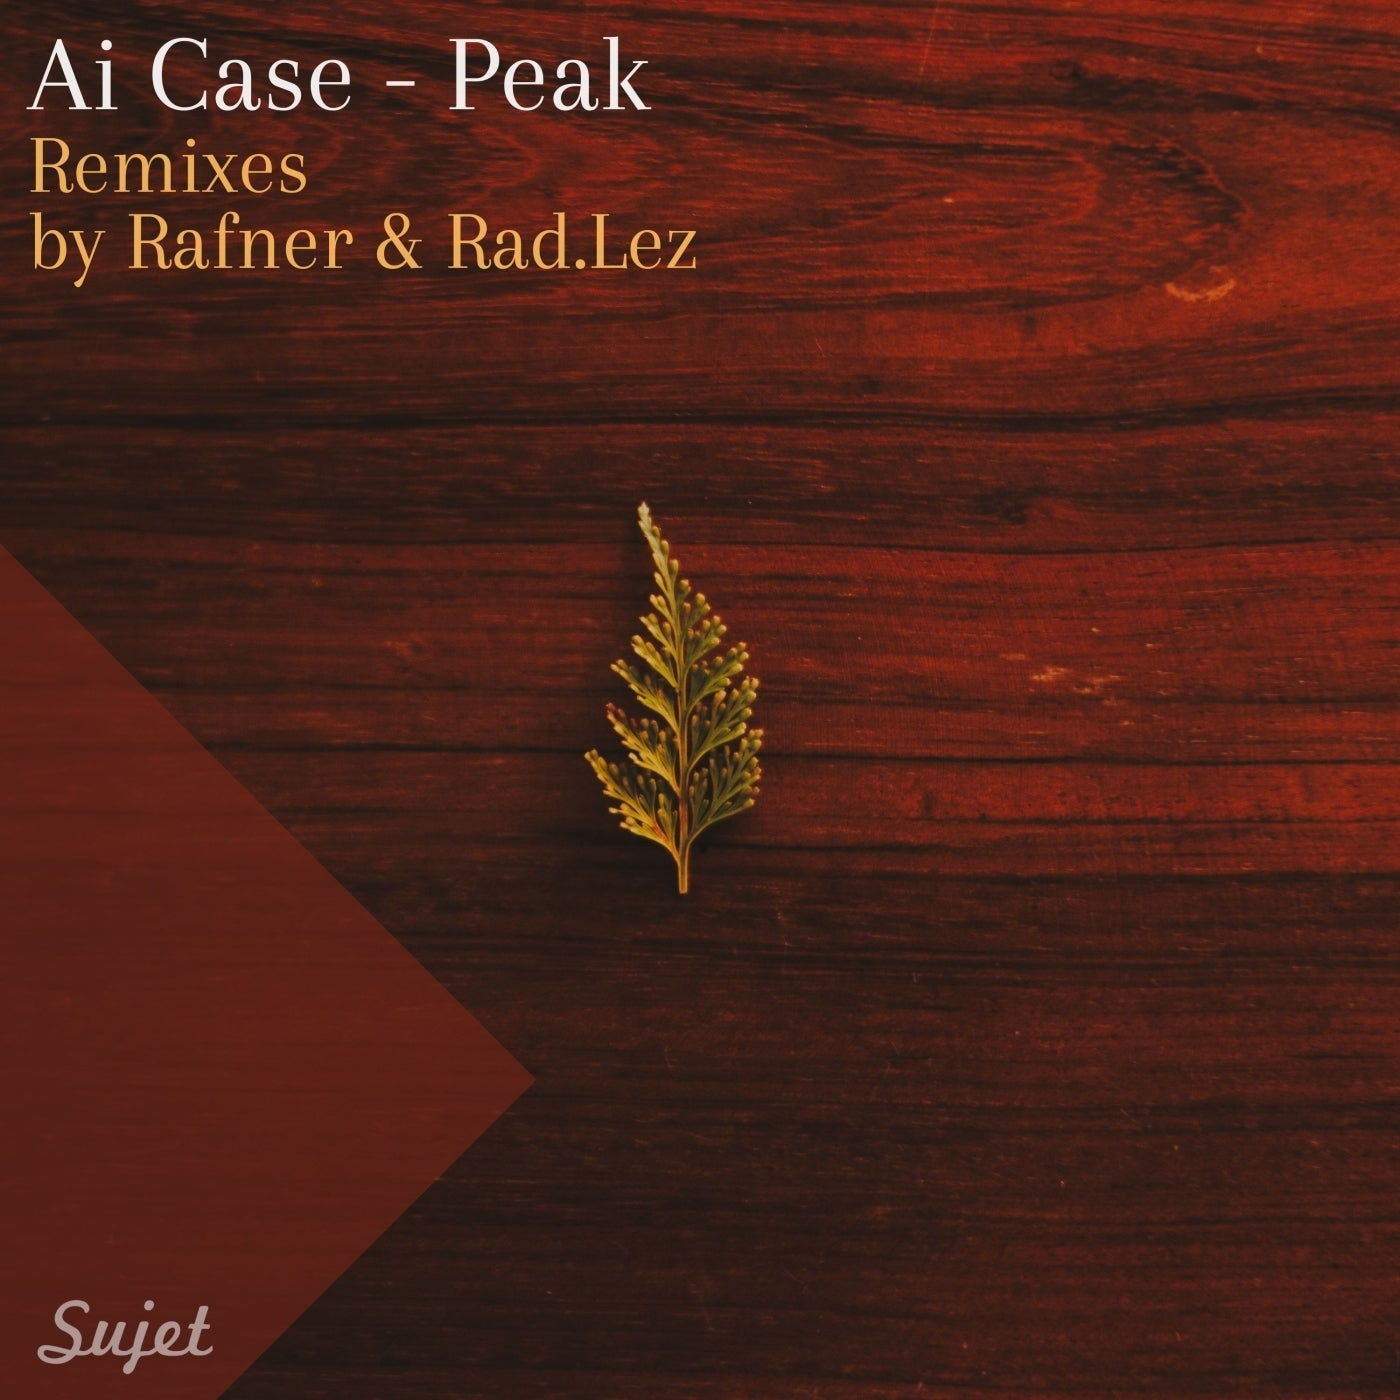 Peak Remixes